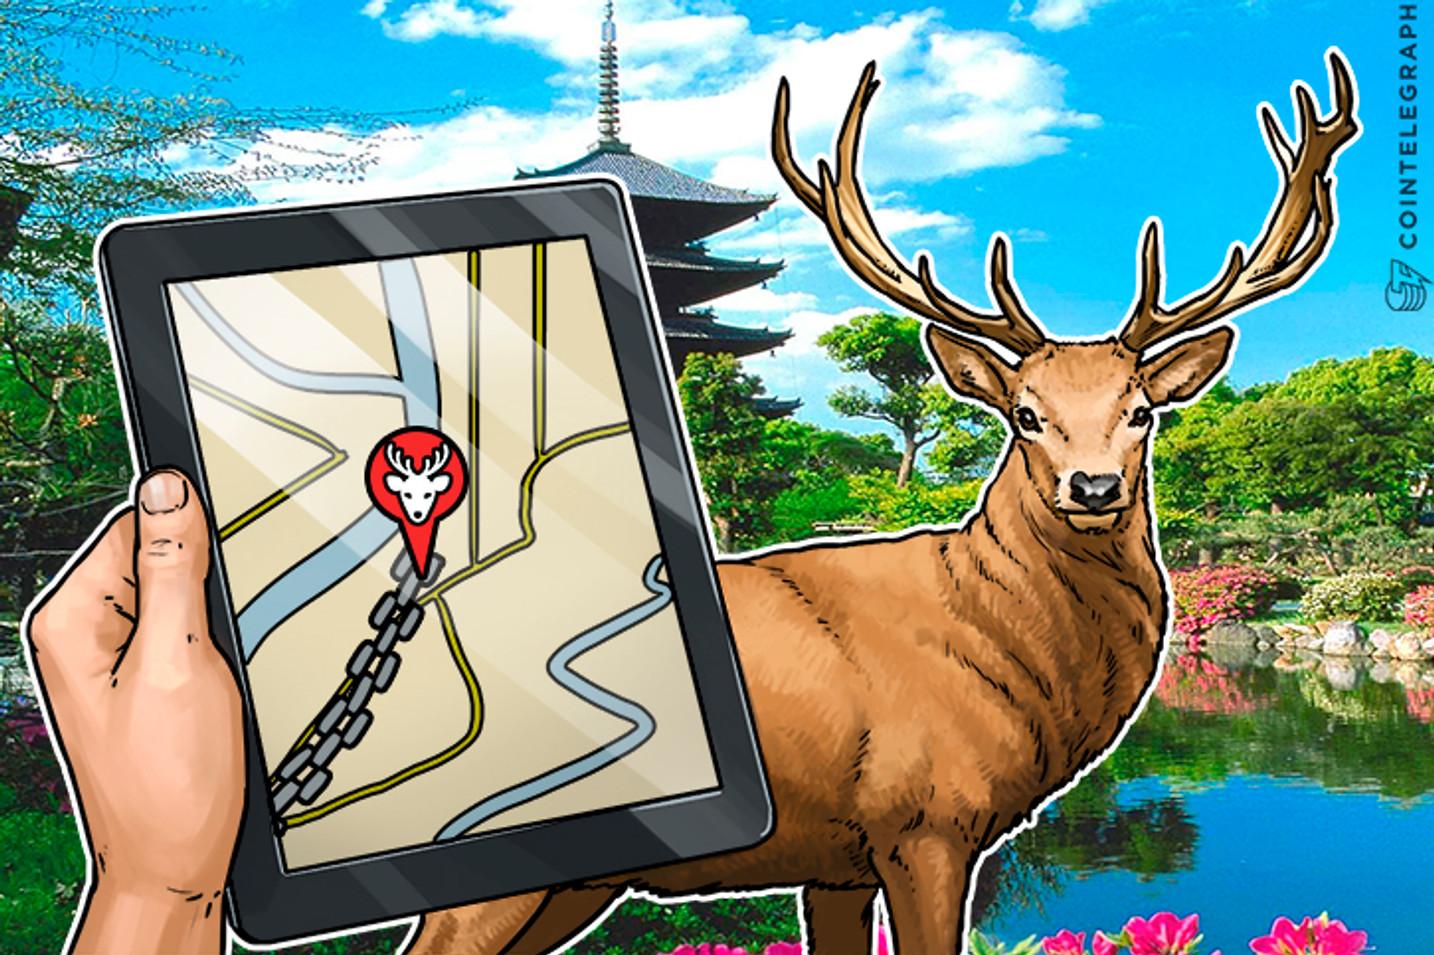 Japoneses usam Blockchain para rastrear carne de caça